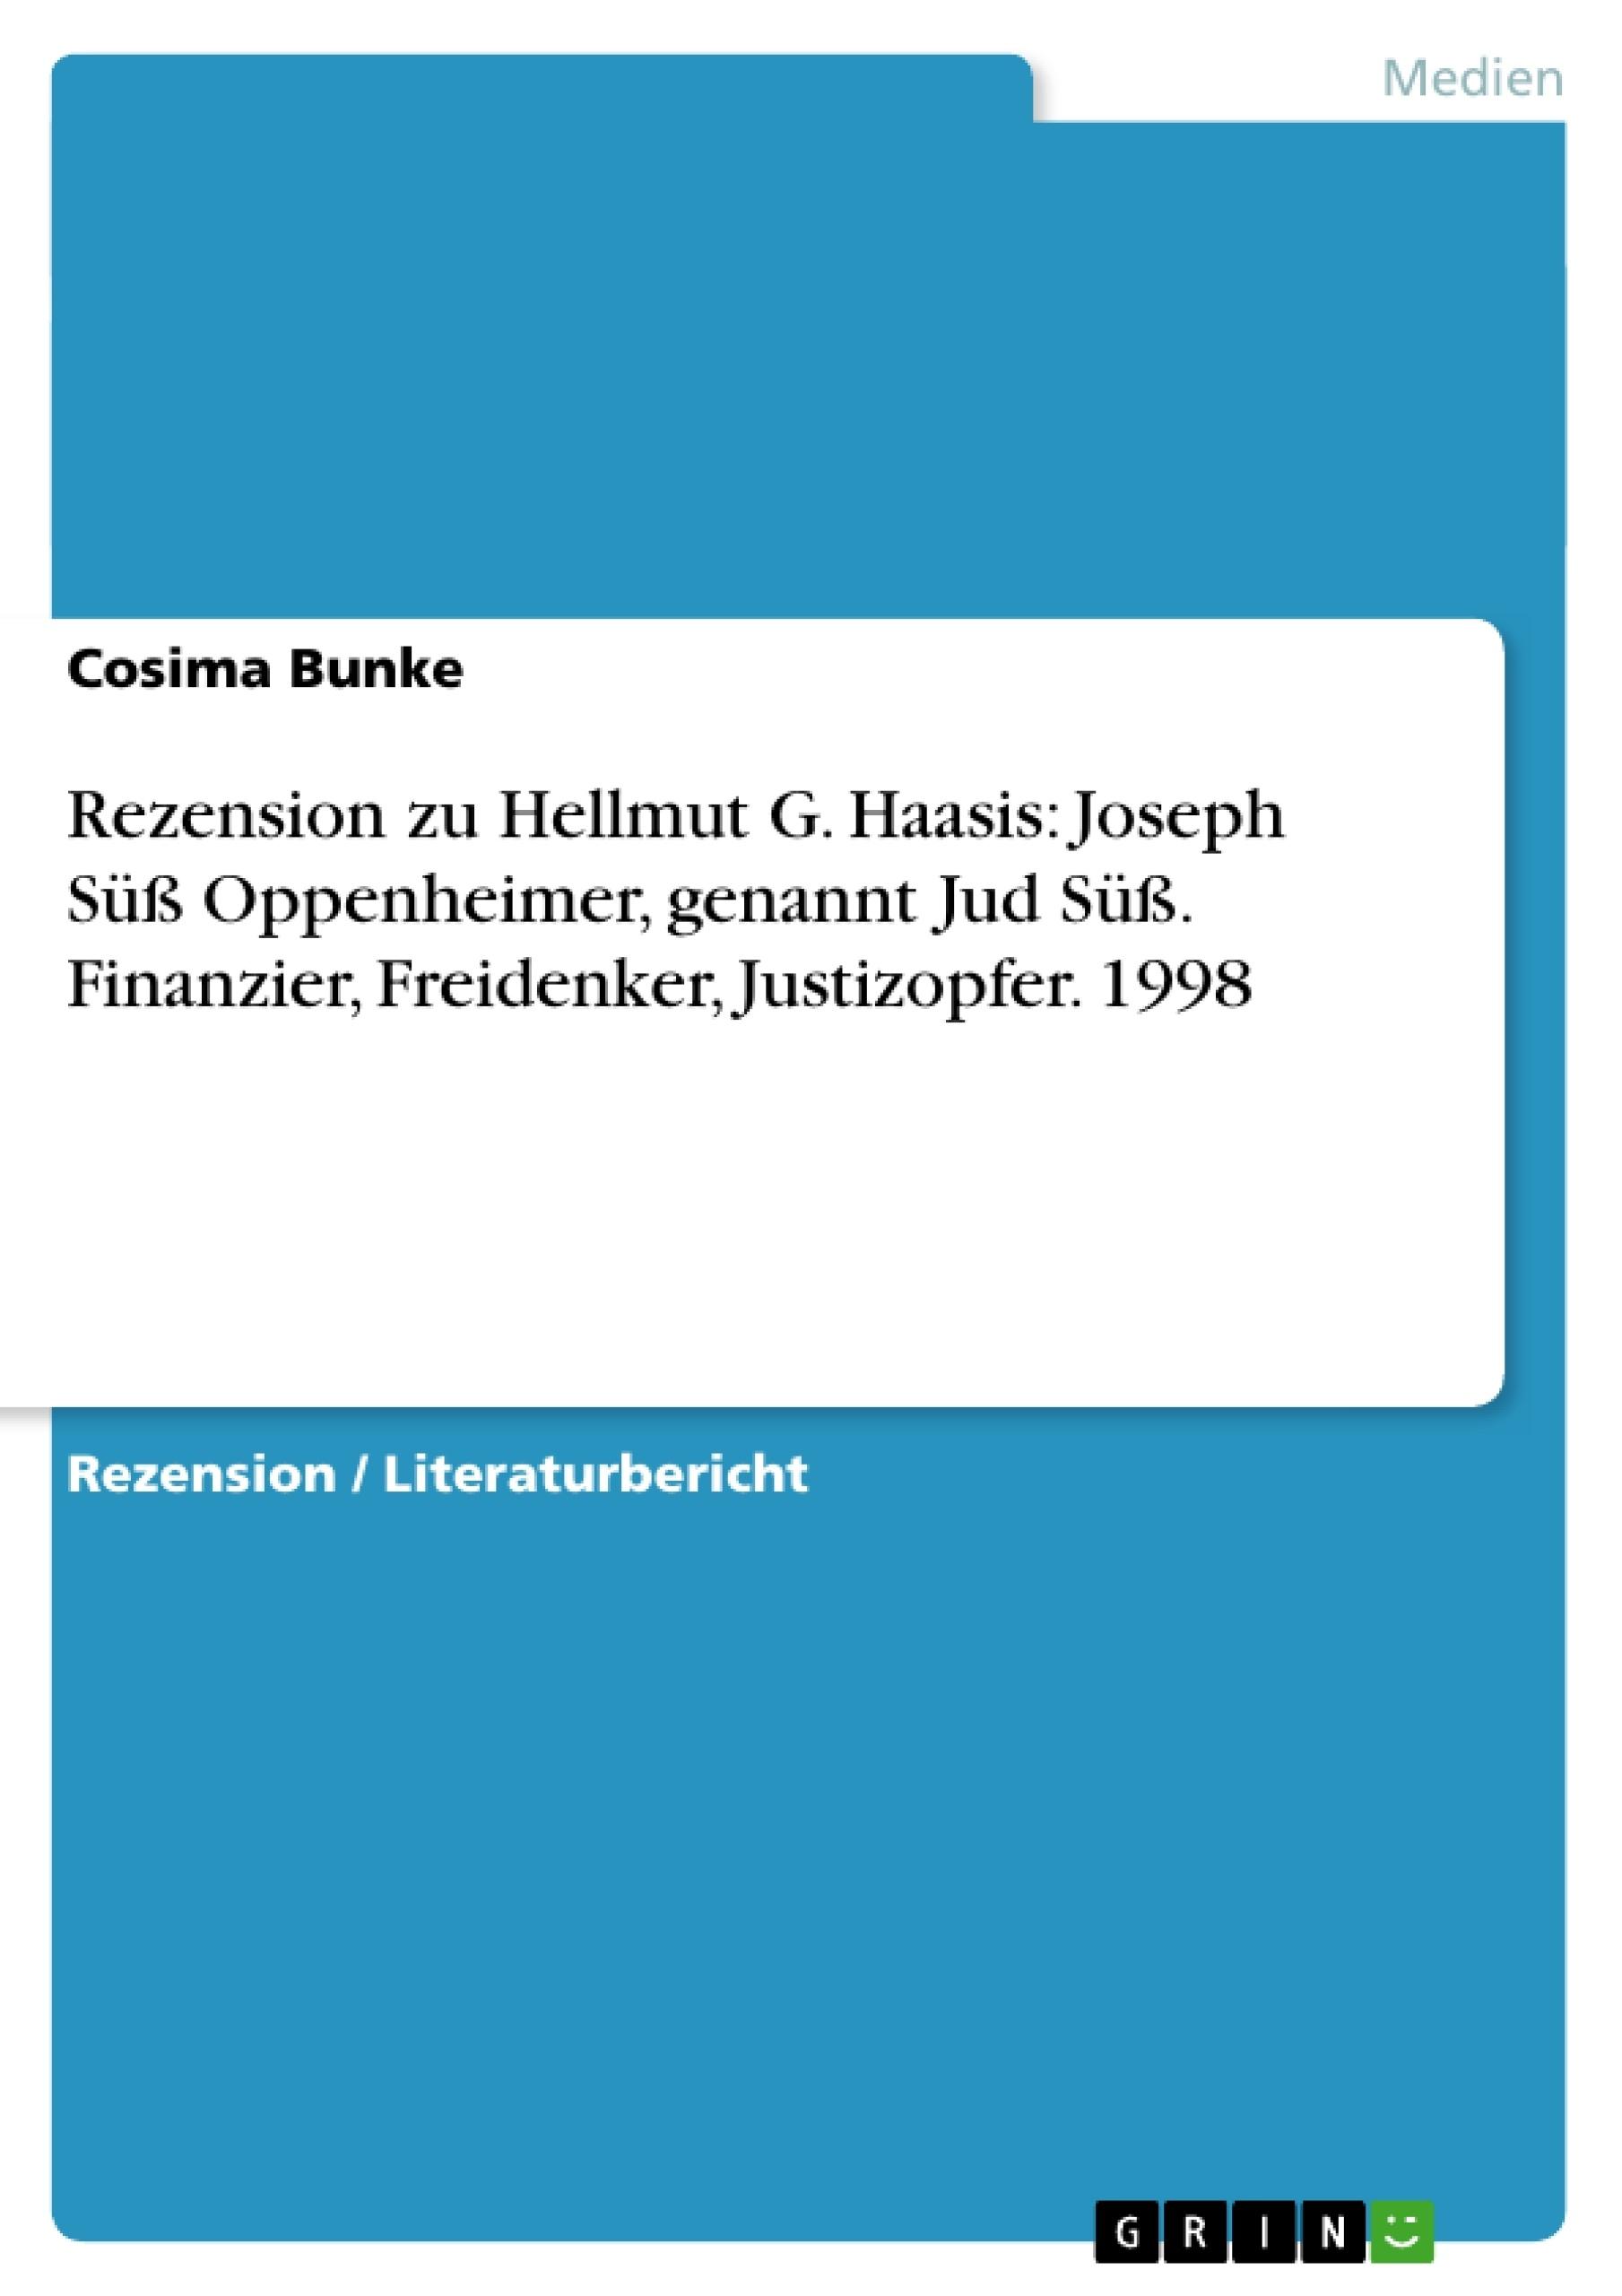 Titel: Rezension zu Hellmut G. Haasis: Joseph Süß Oppenheimer, genannt Jud Süß. Finanzier, Freidenker, Justizopfer. 1998